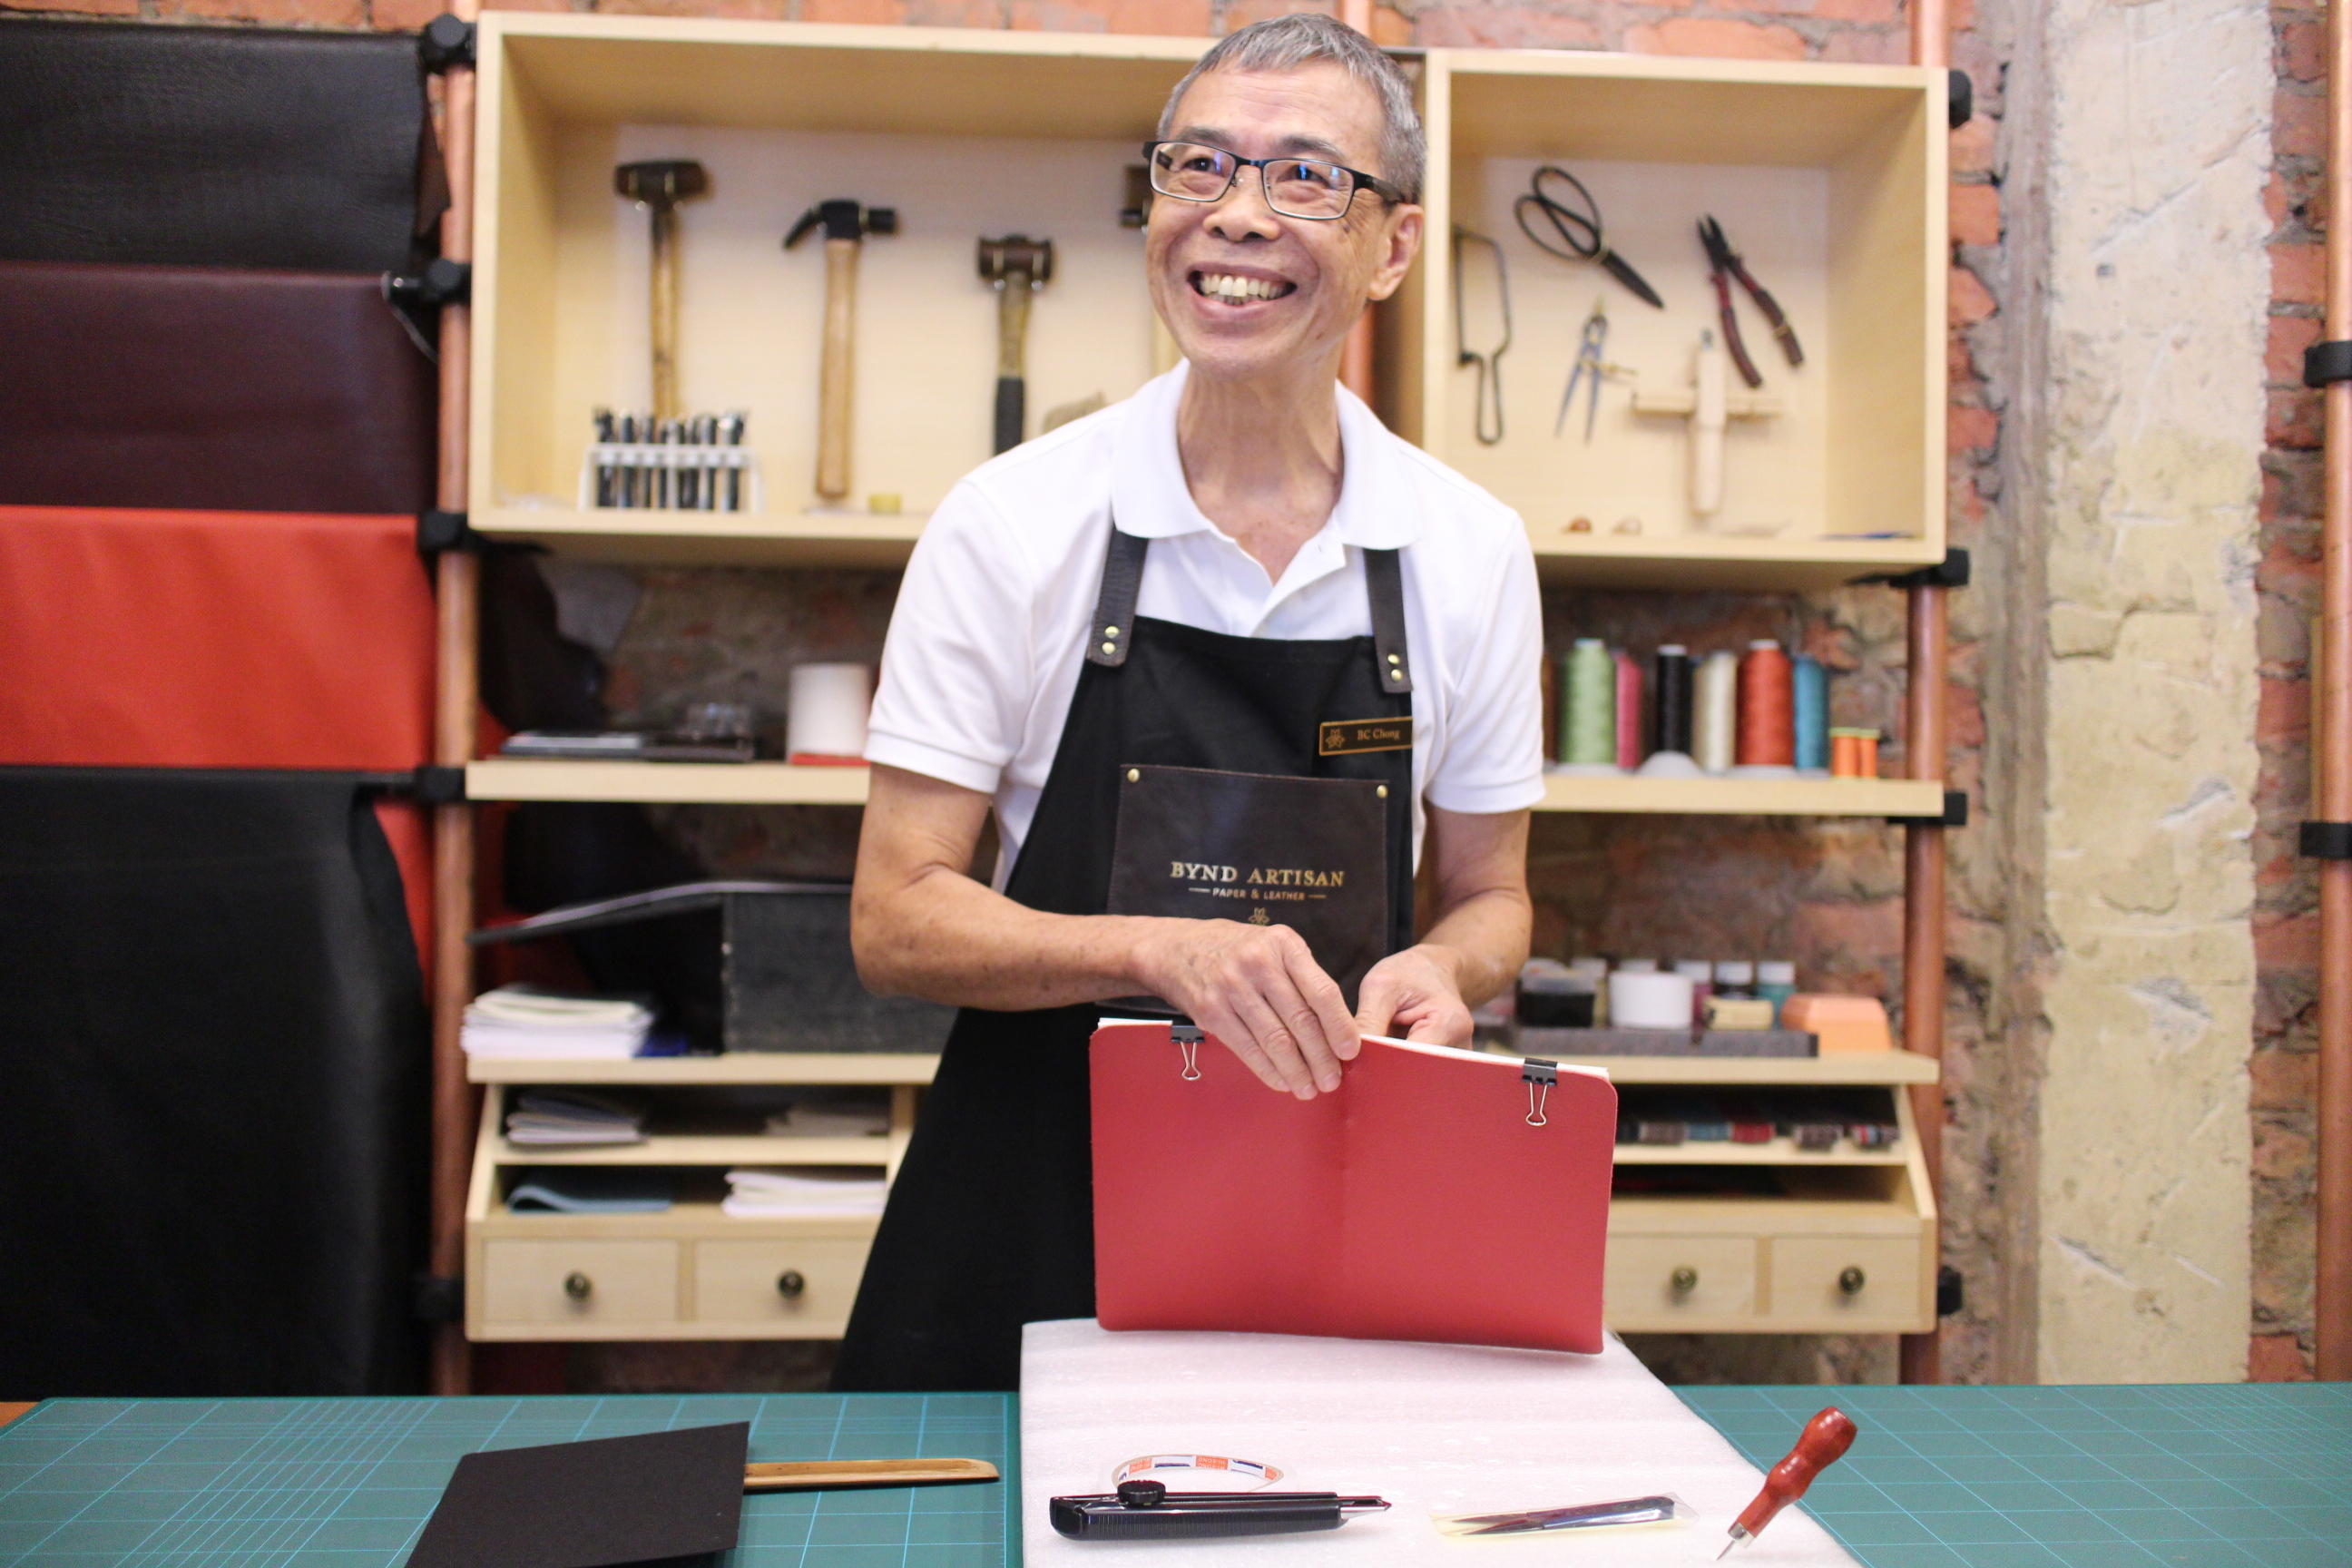 Chong Beng Cheng of Bynd Artisan